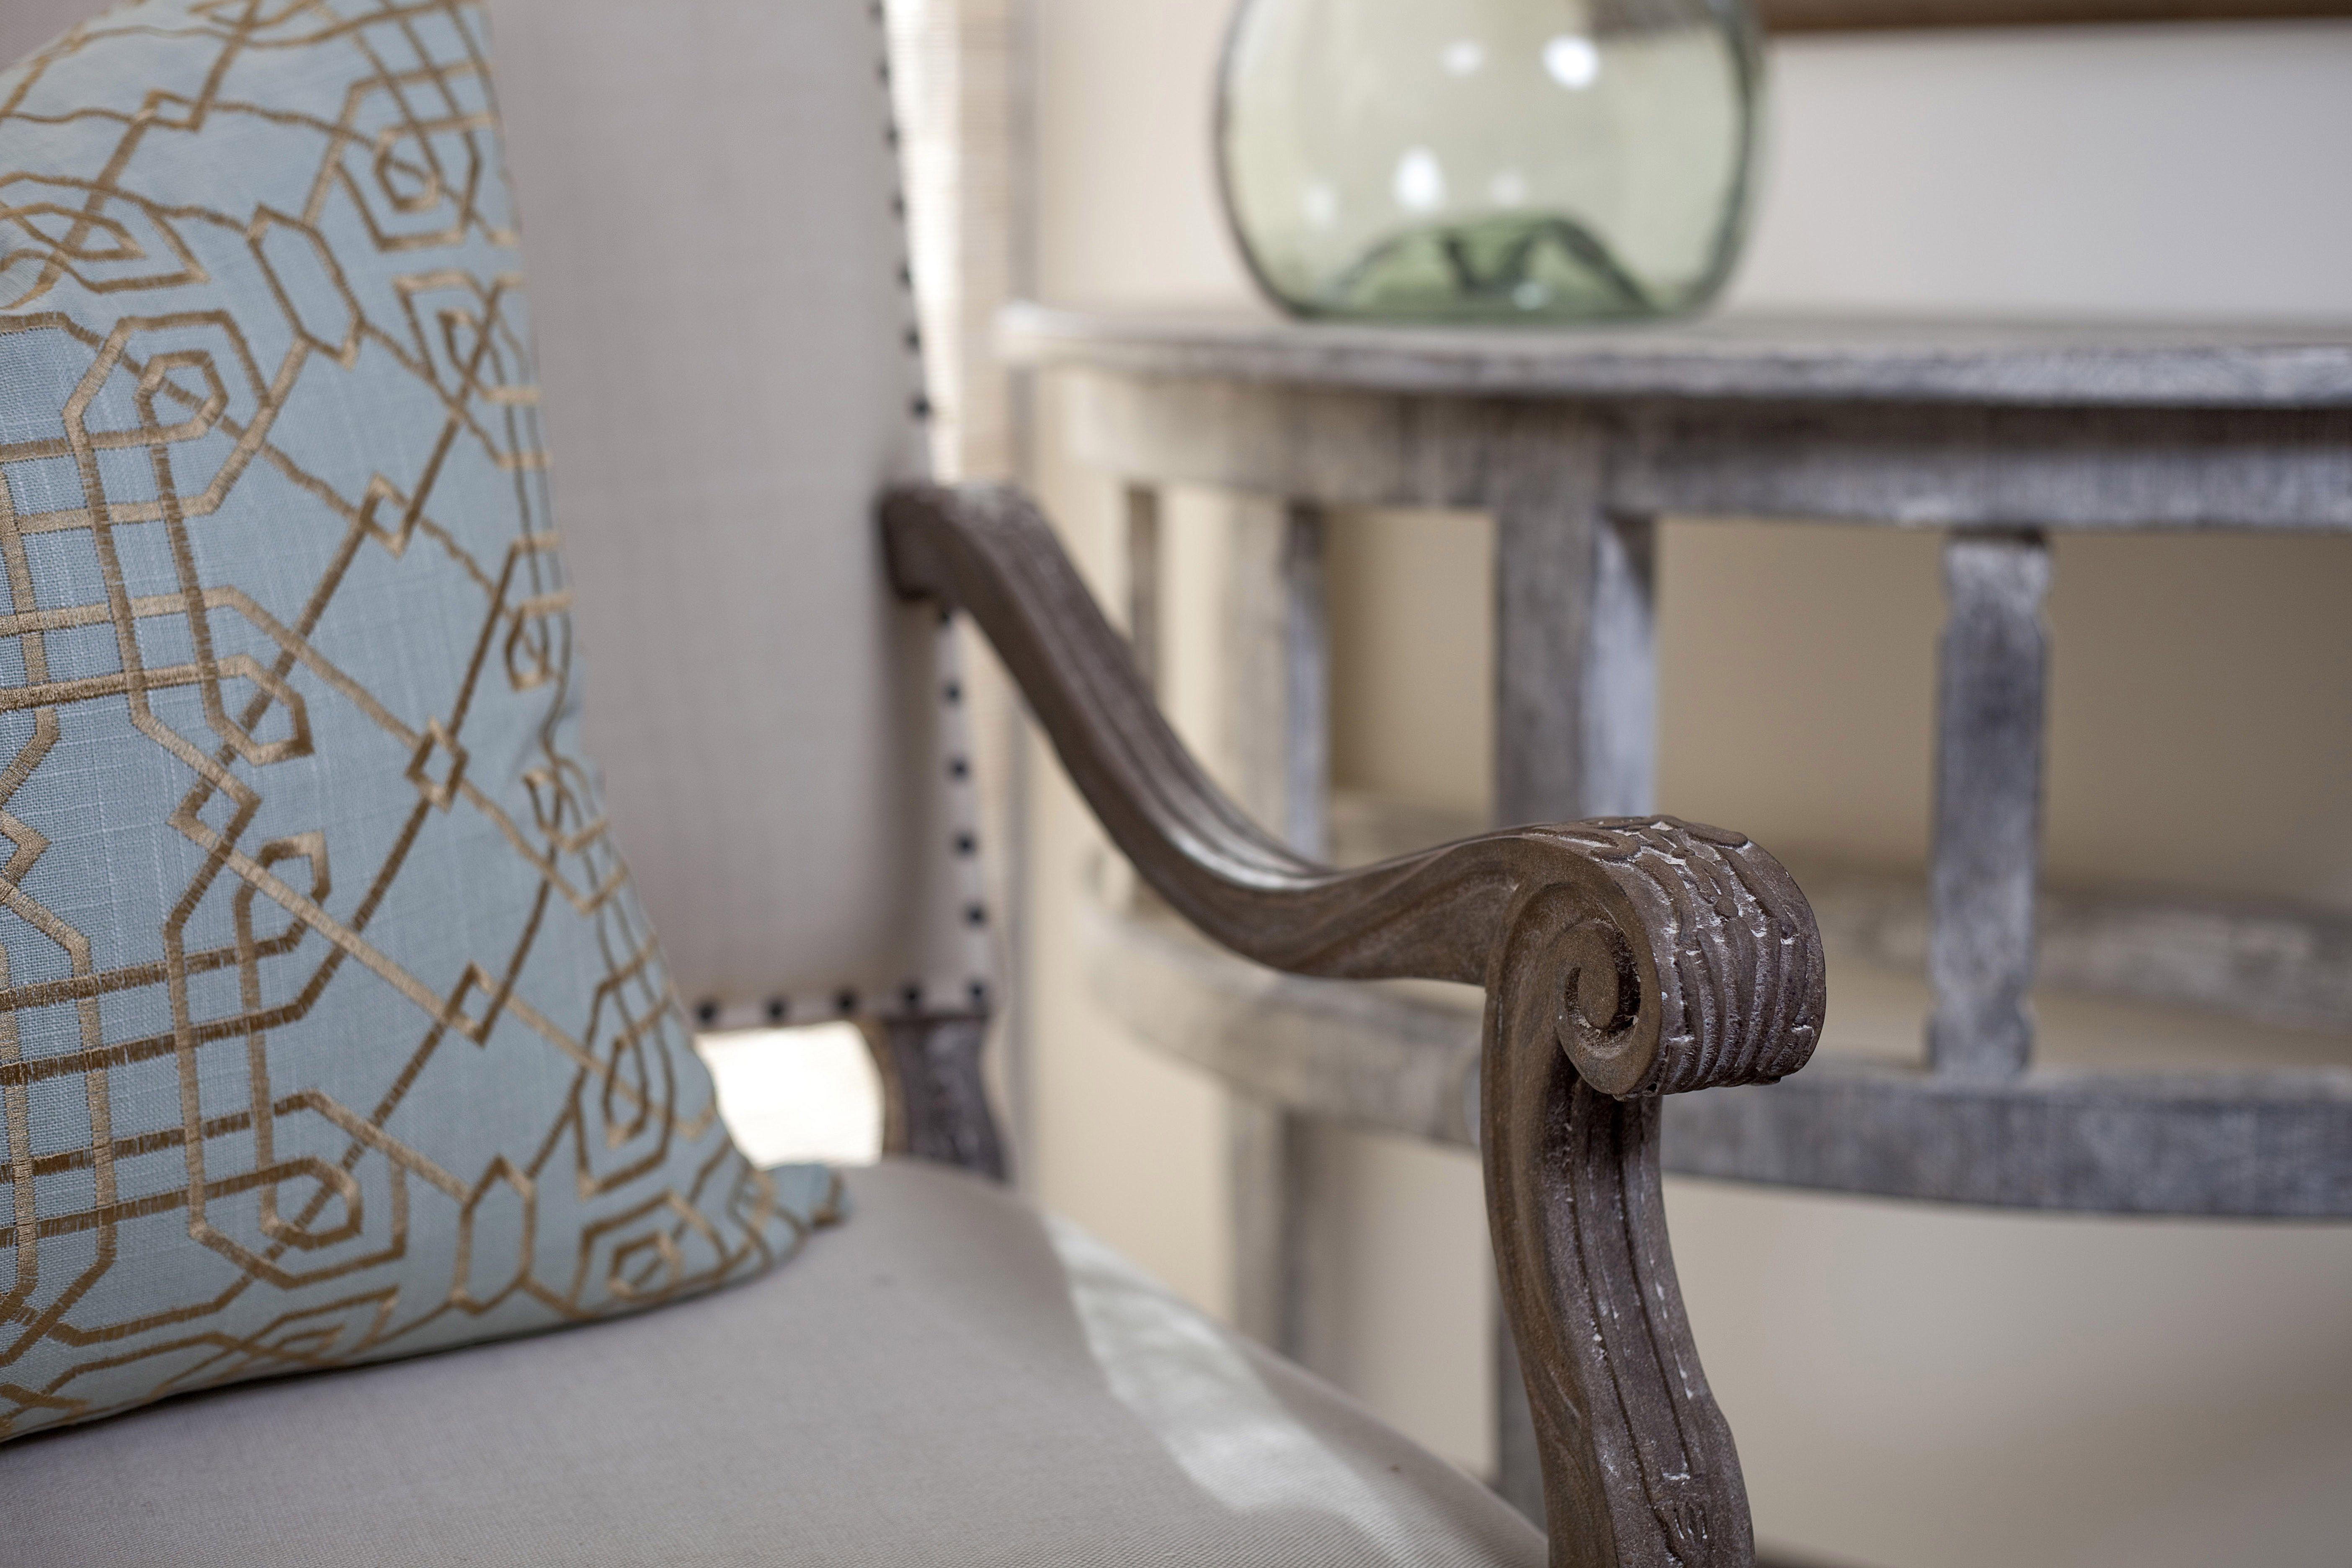 Charming Noir Furniture Http://www.noirfurniturela.com/